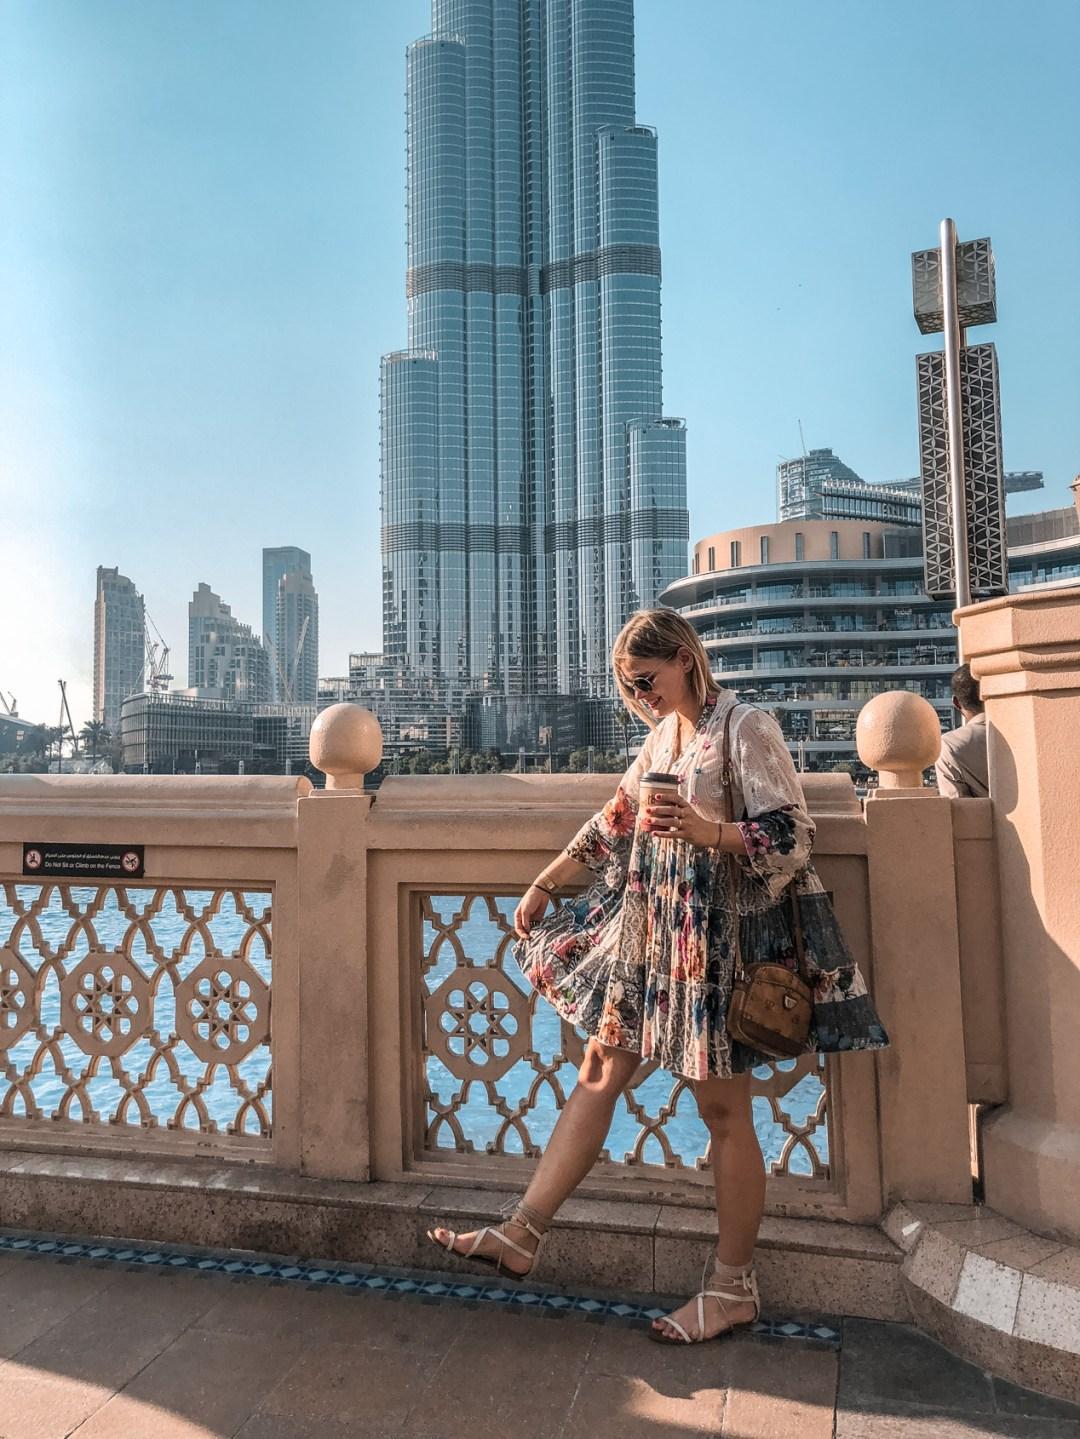 Lookbook, Abu Dhabi, Dubai, what to wear in Abu Dhabi, Dubai, Outfits, Inspiration, www.lakatyfox.com